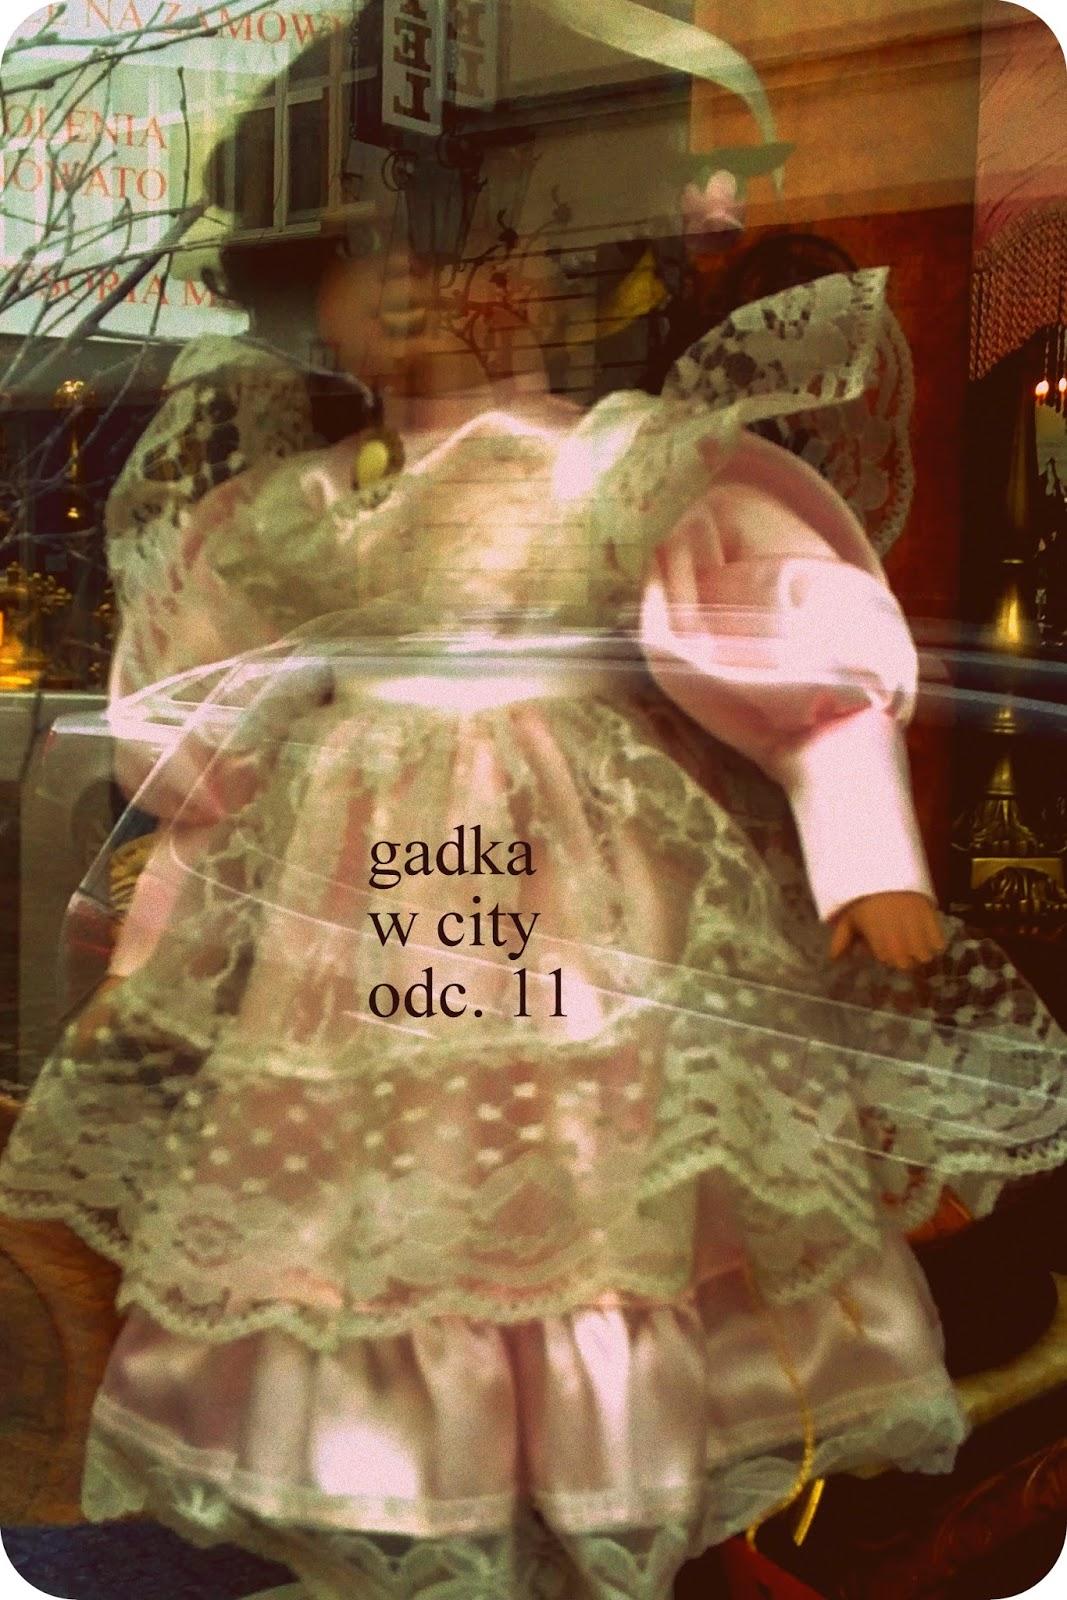 http://gadkaszmatkanabis.blogspot.com/2014/03/gadka-w-city-odc11-karton-lansu.html